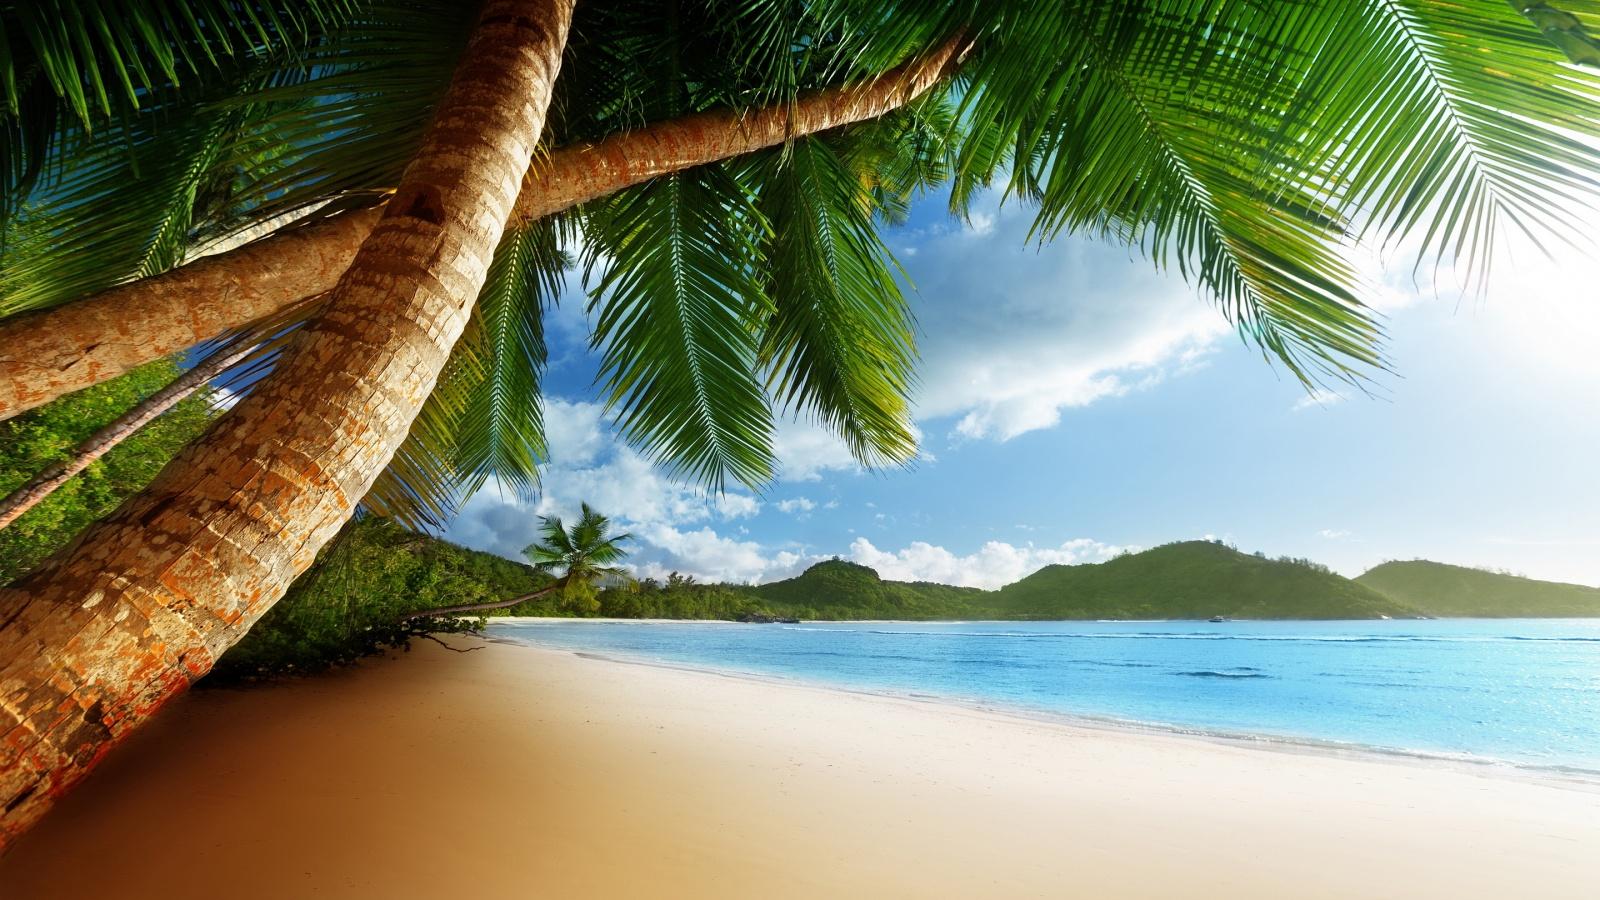 Beach caribbean Wallpaper in 1600x900 HD Resolutions